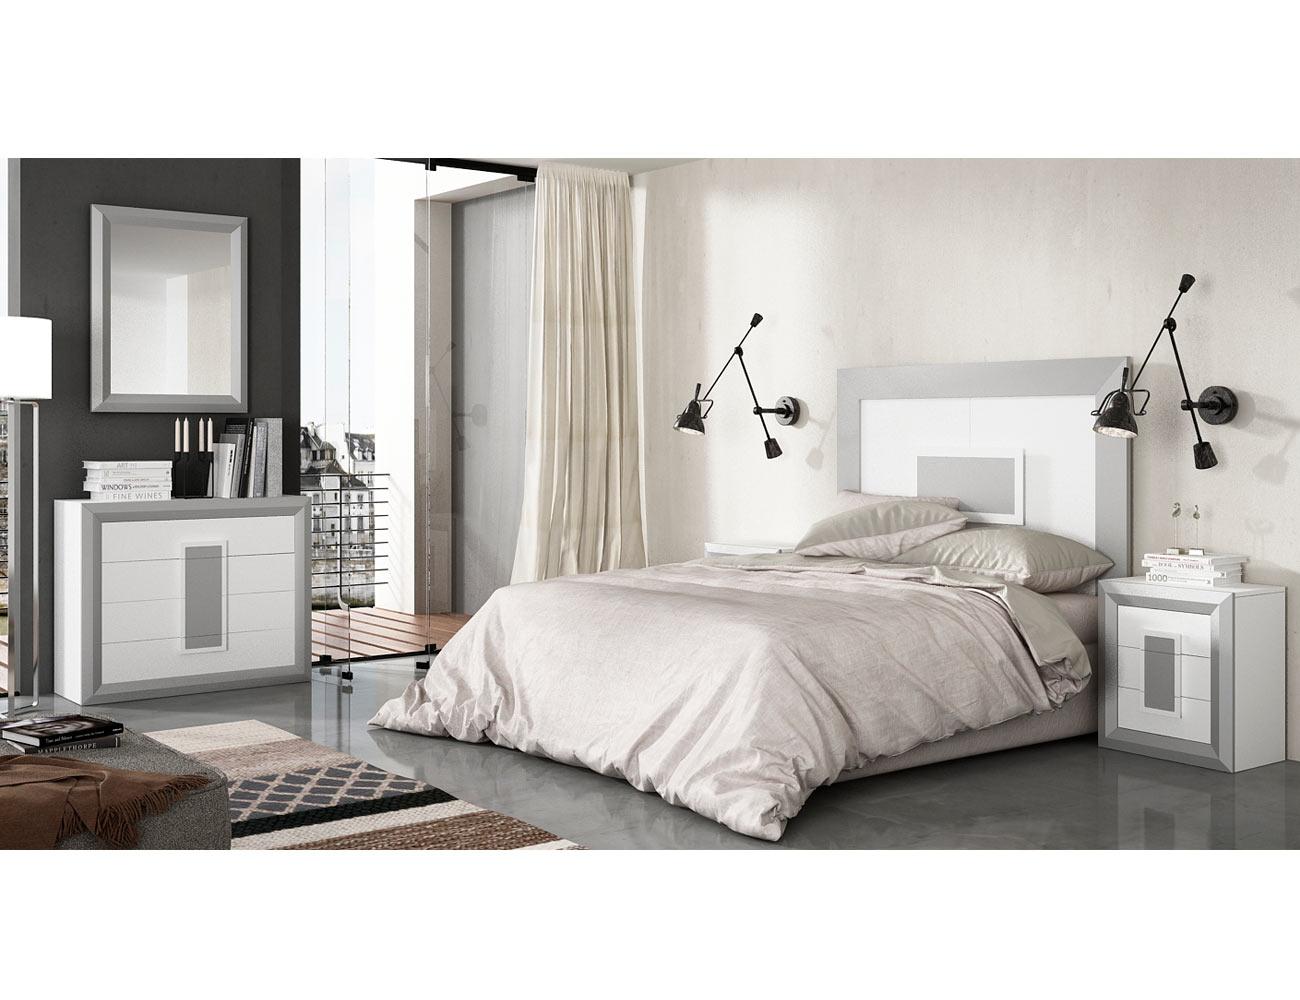 C moda con marco espejo para dormitorio de matrimonio for Comoda matrimonio